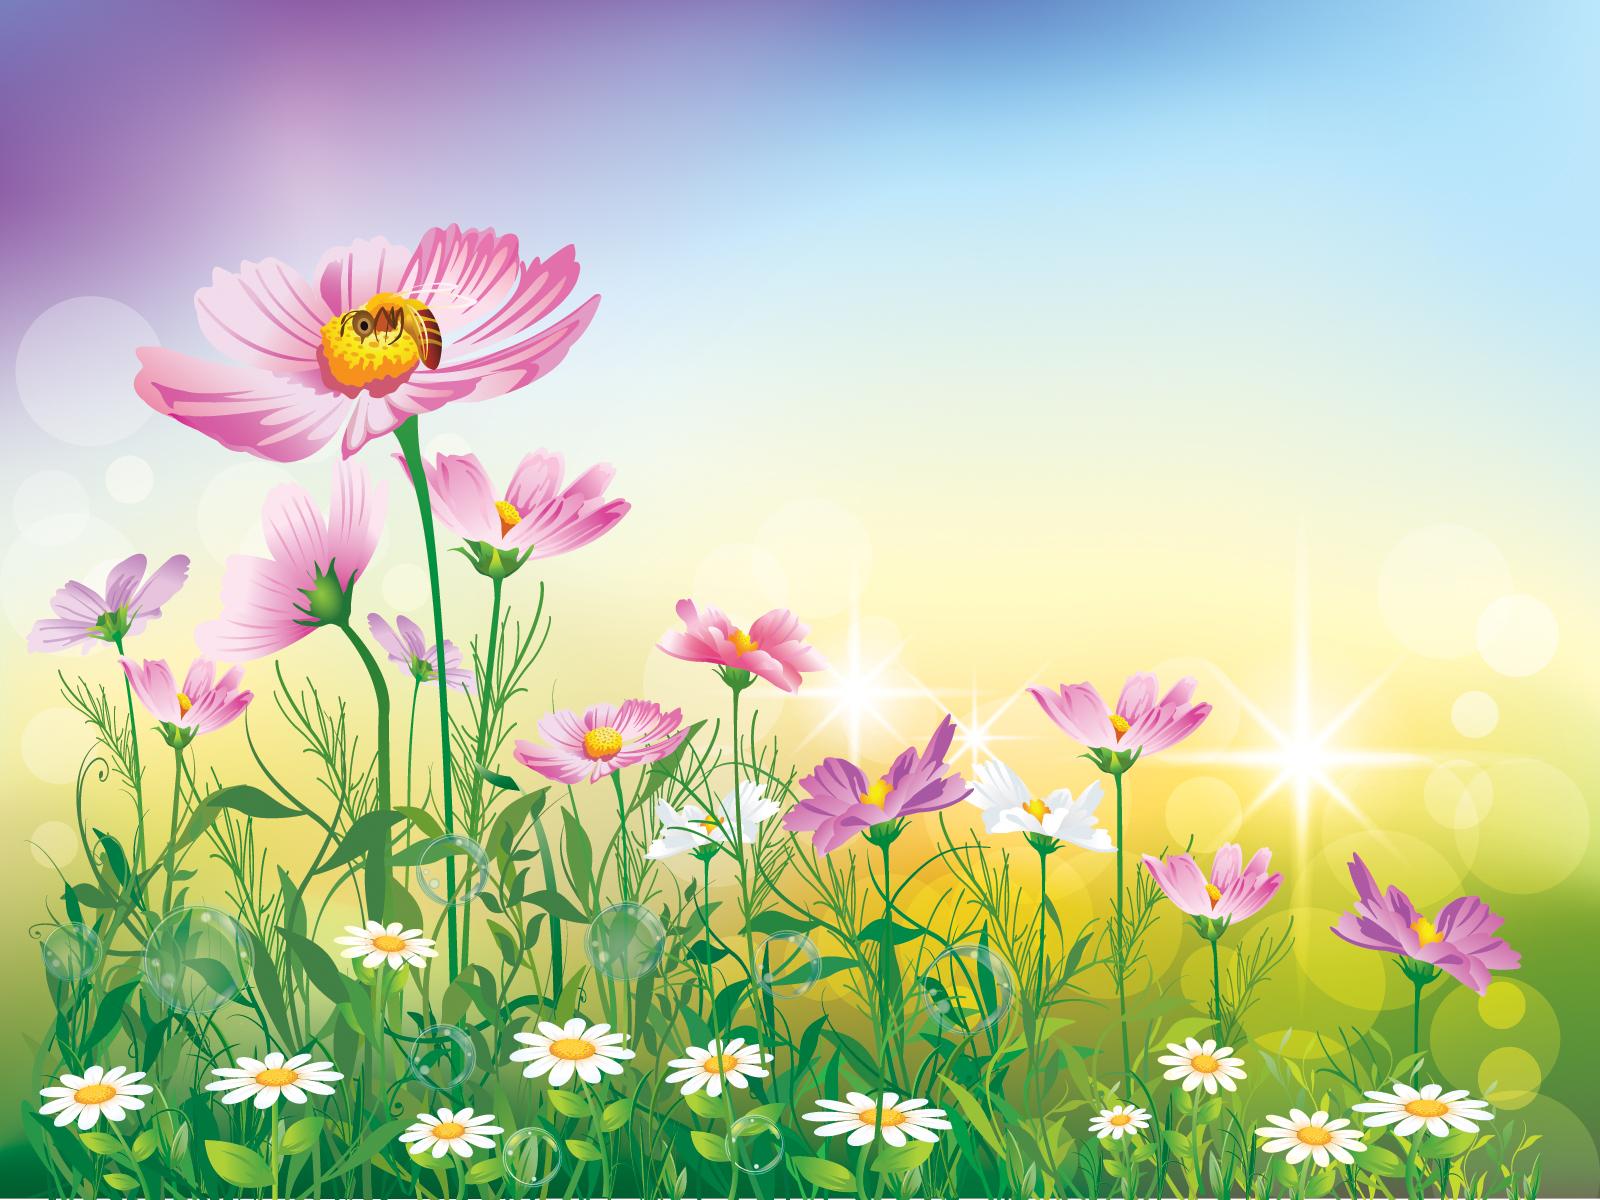 Pink powerpoint templates flowers. Background clipart flower garden